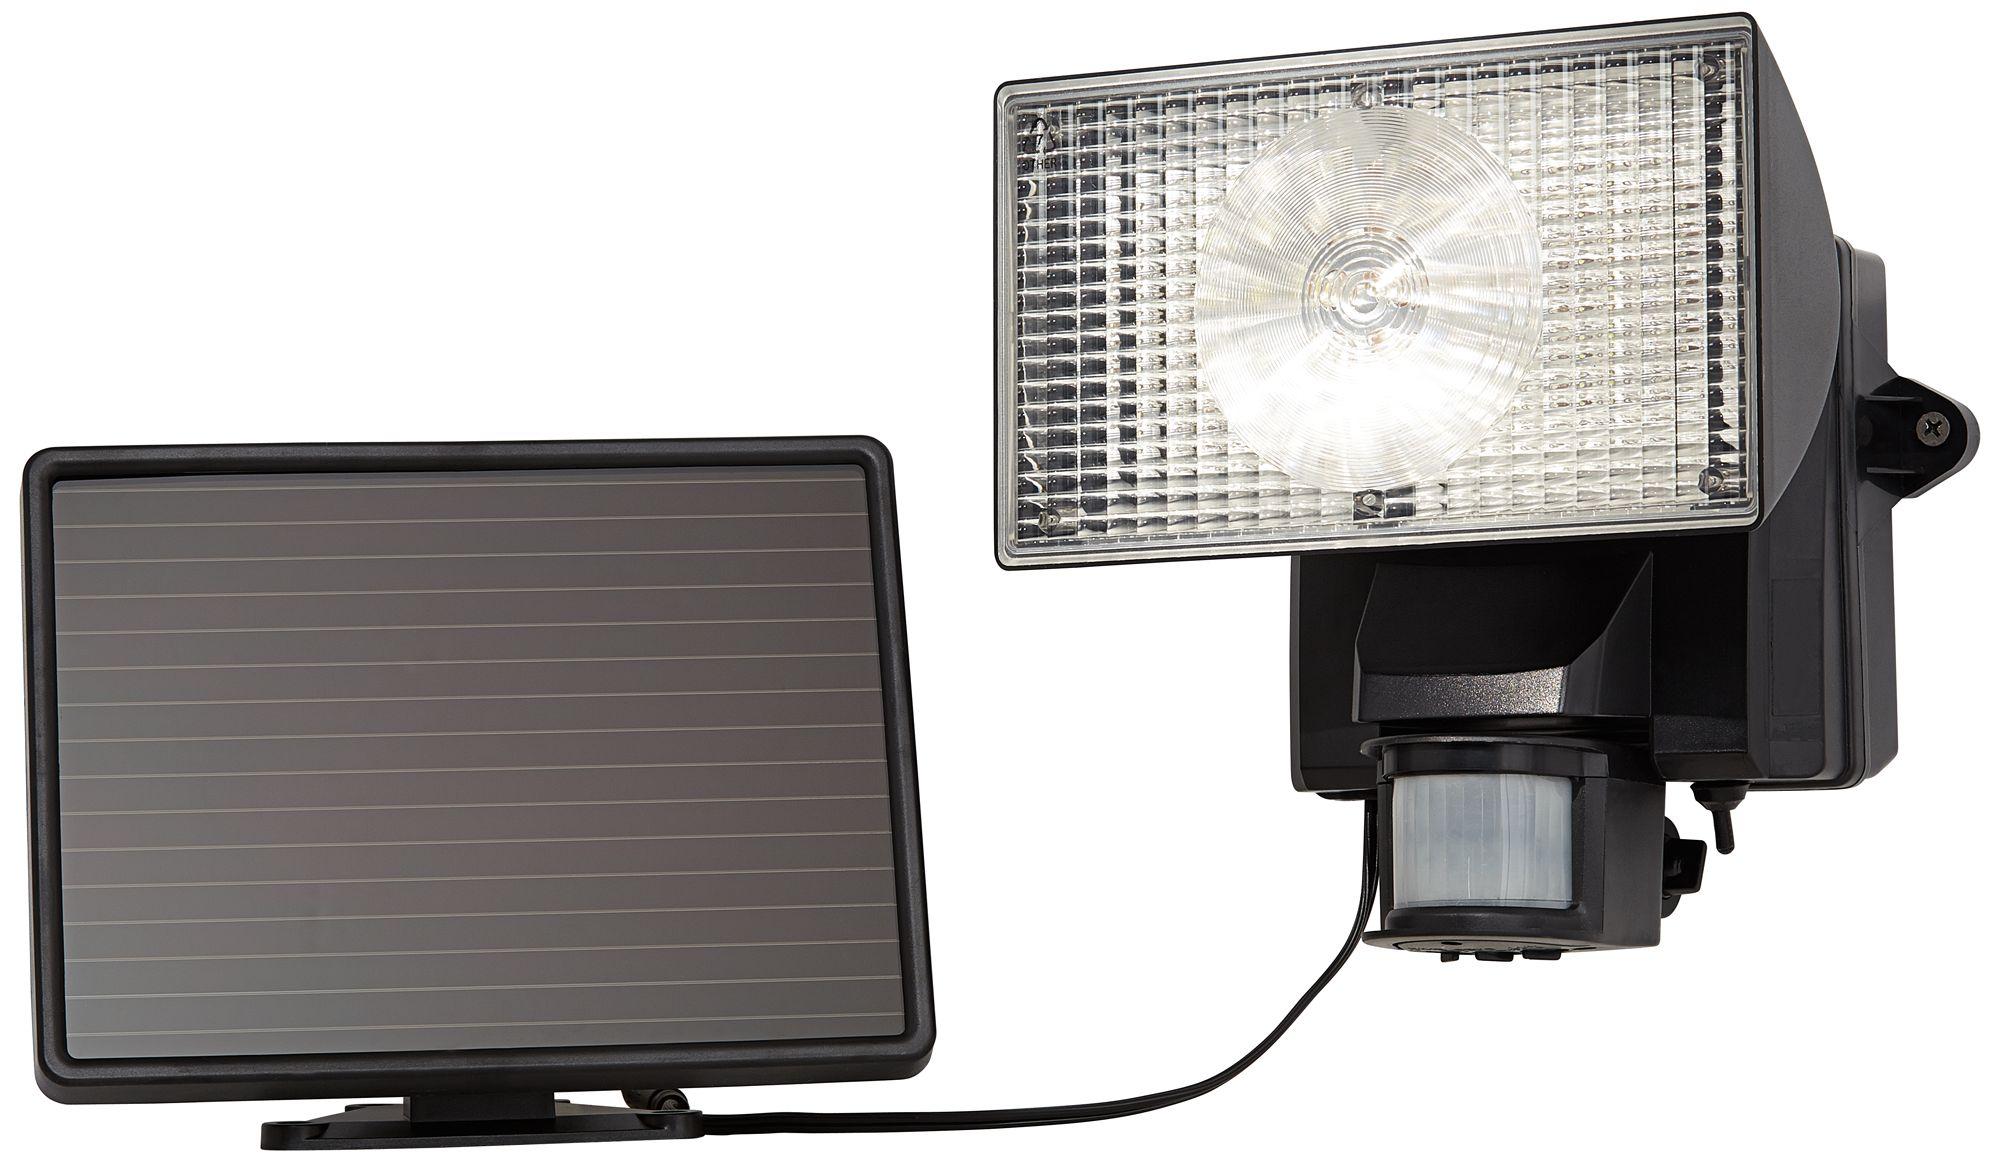 Black Solar Power Motion Sensor 80 LED Flood Light T4486 Lamps Plus